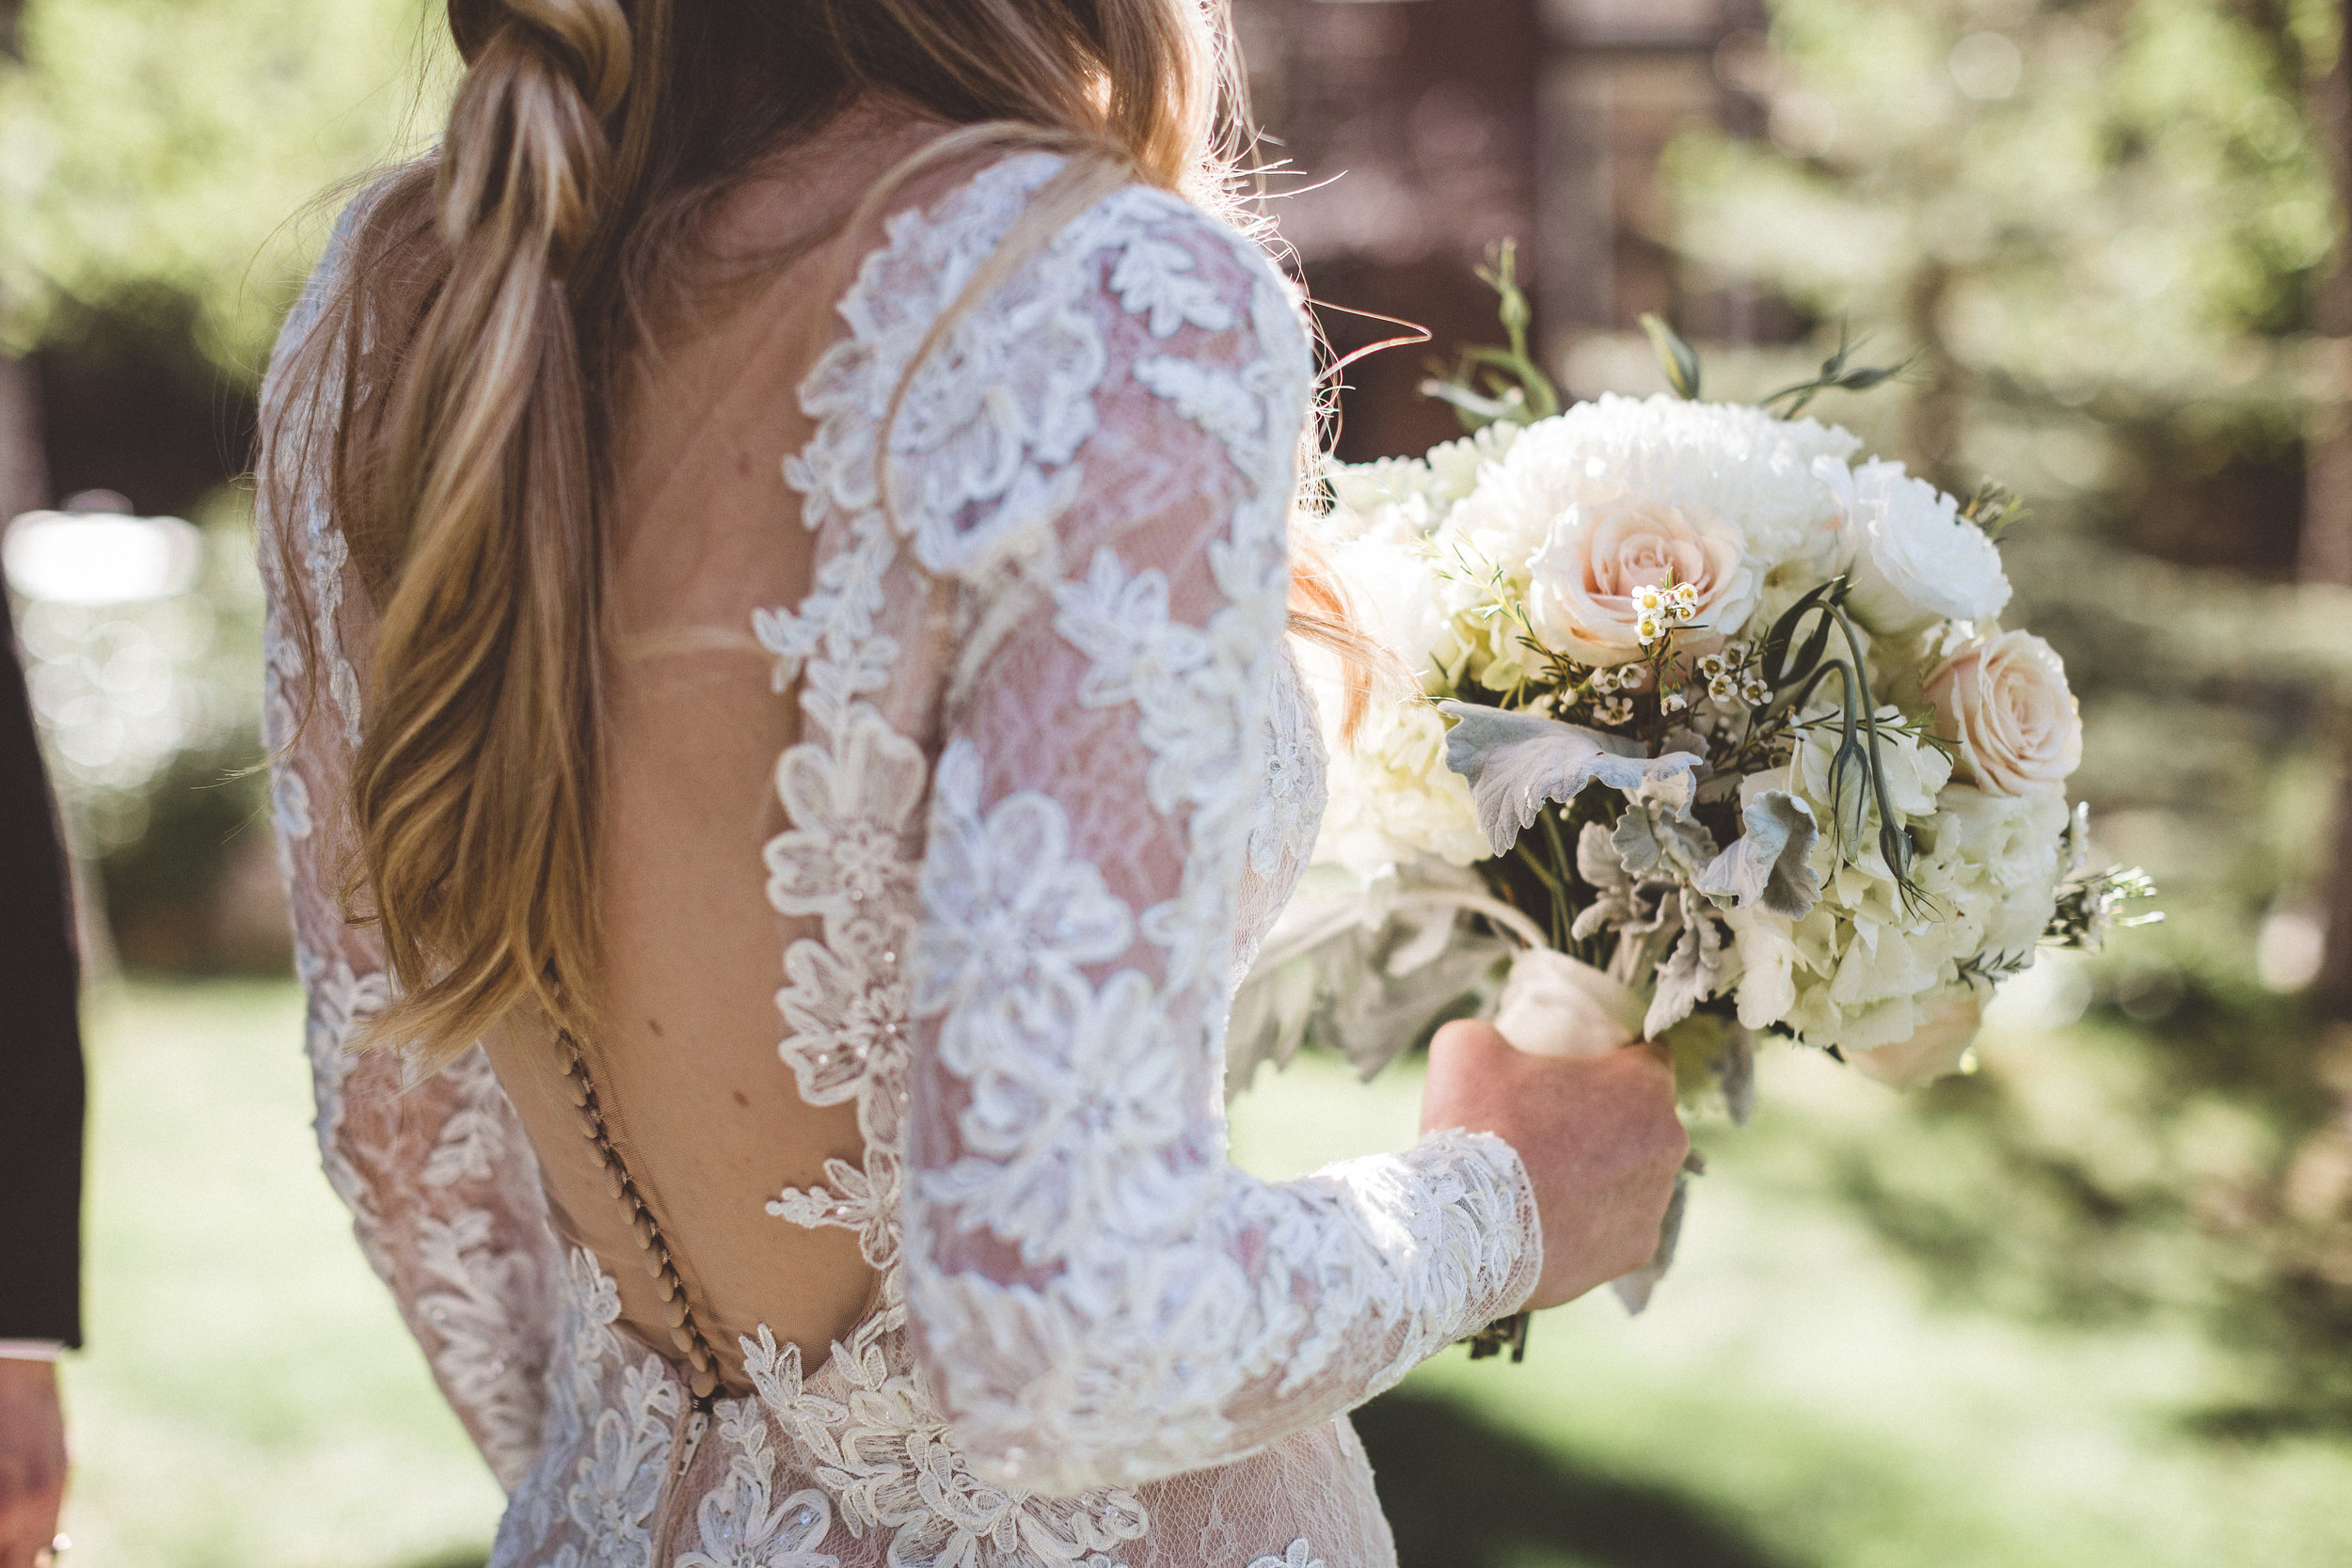 jill-and-alexs-intimates-big-bear-wedding28.jpg